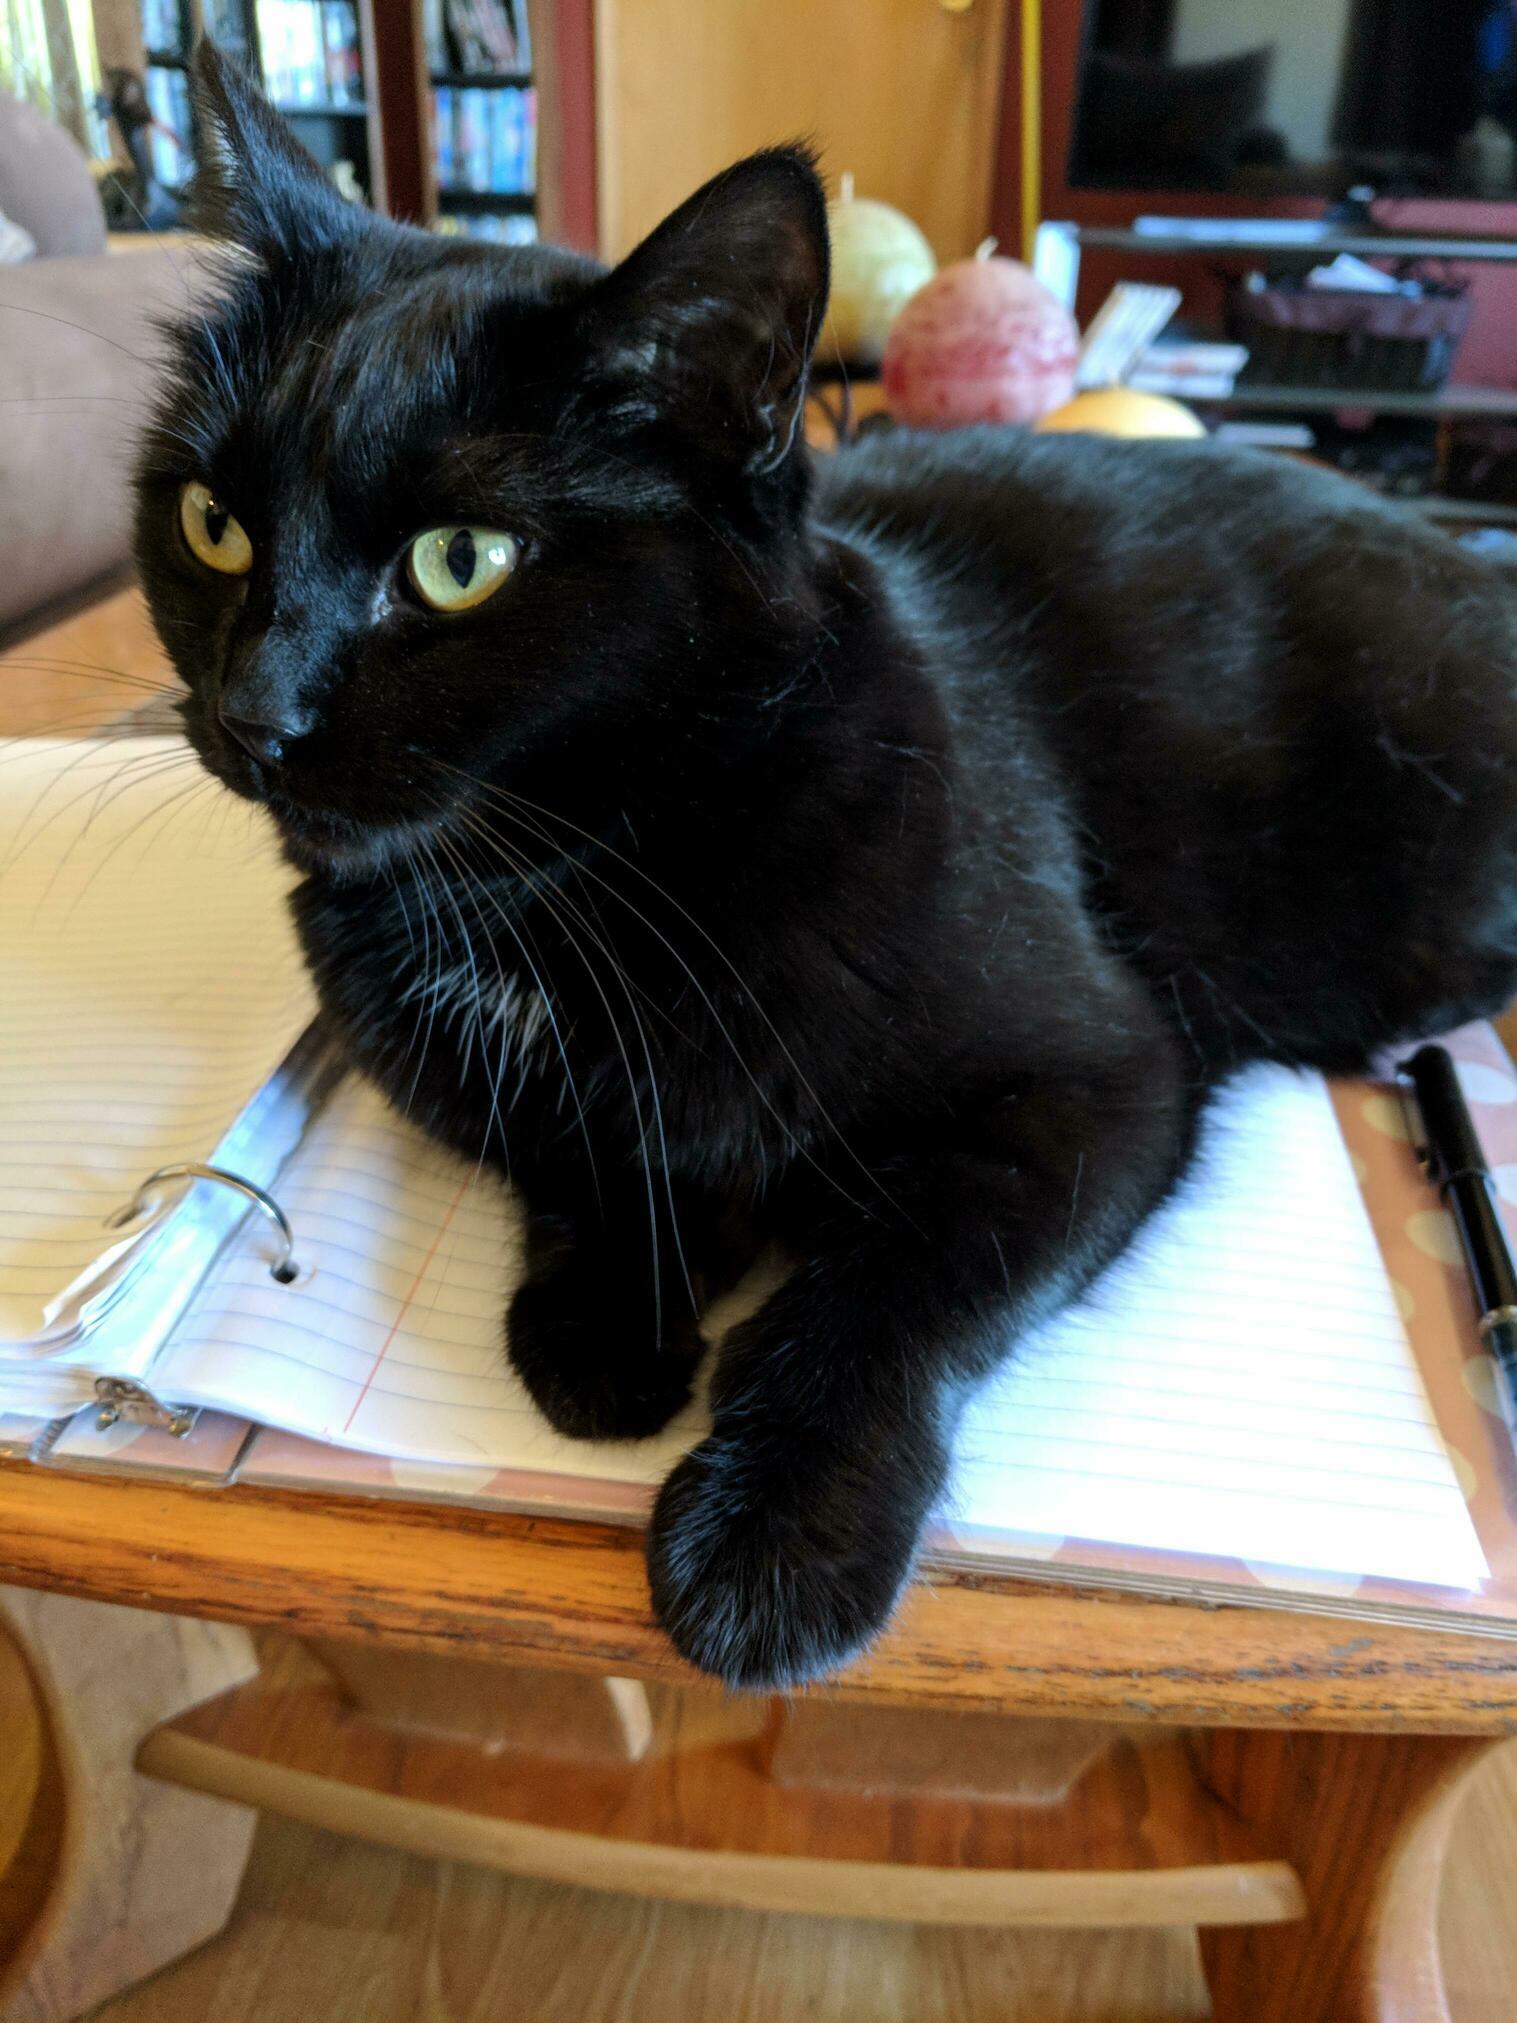 Bandit likes to help me write music